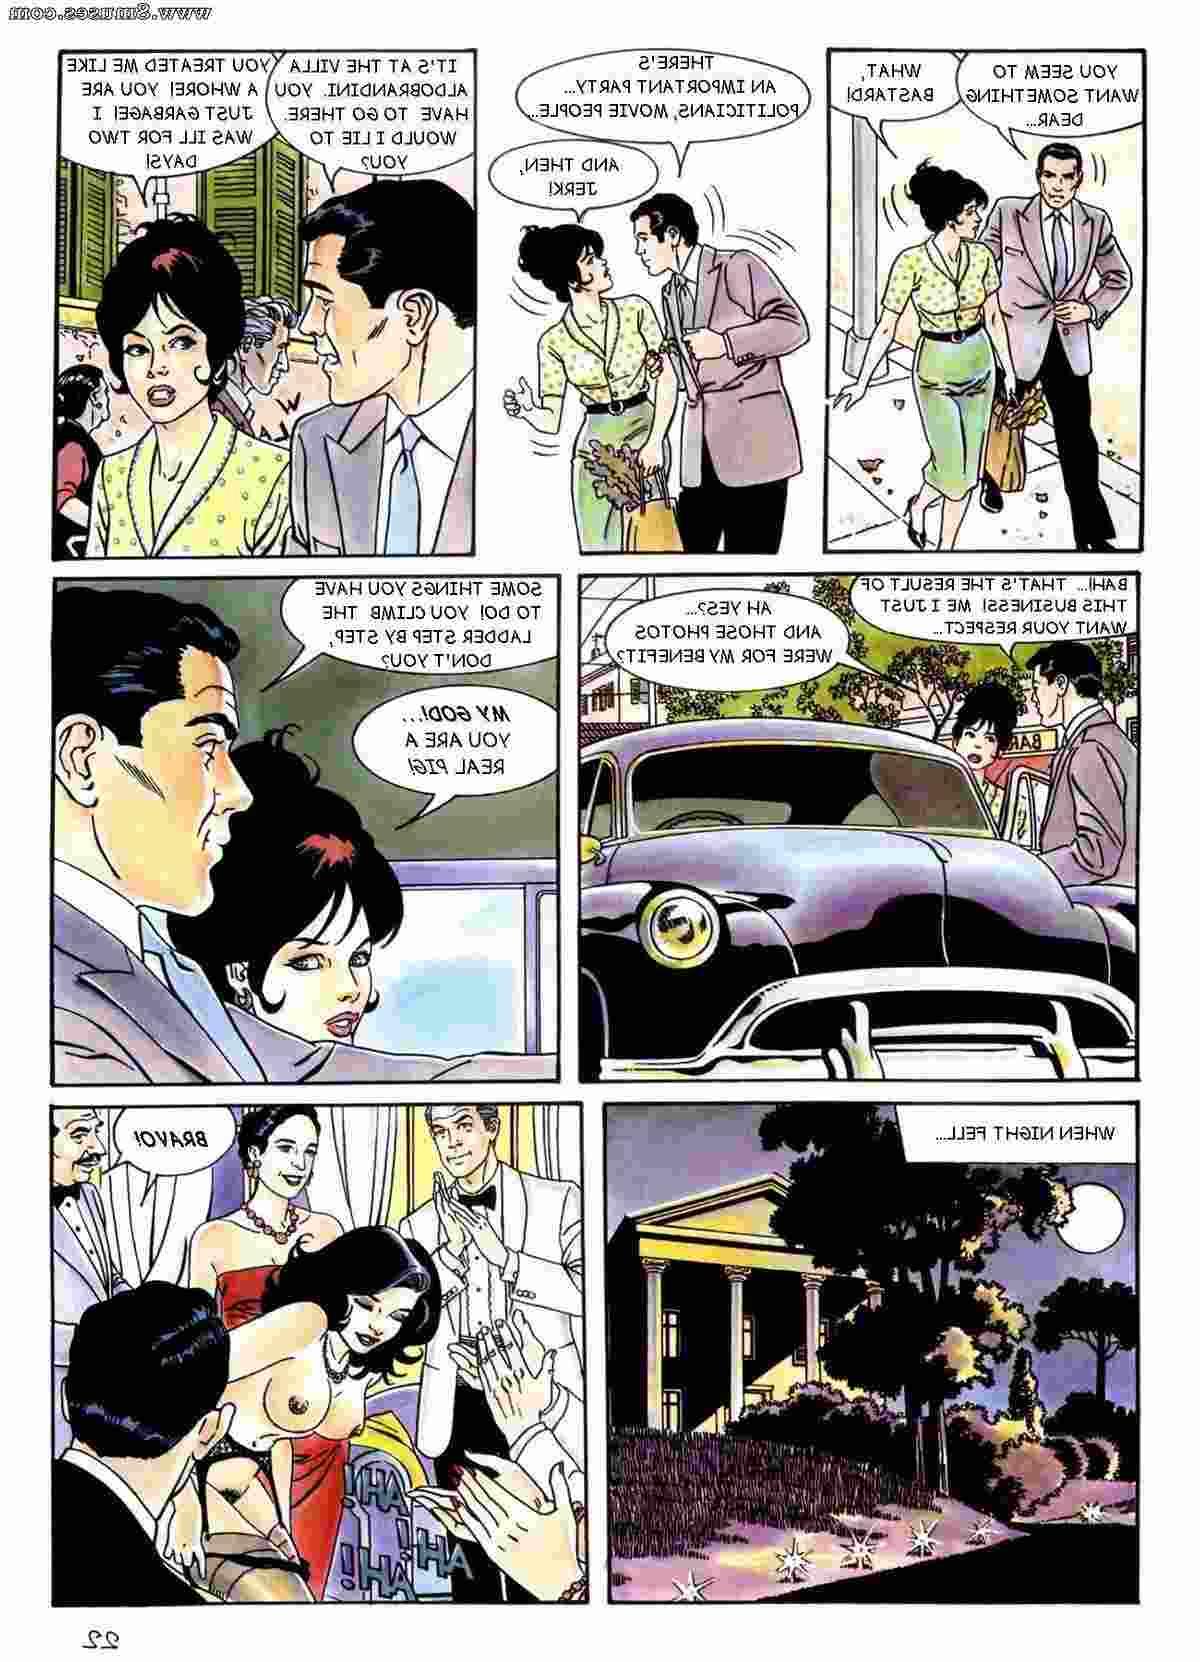 Stramaglia-Morale-Comics/Anna-Perverted-Innocence Anna_Perverted_Innocence__8muses_-_Sex_and_Porn_Comics_25.jpg